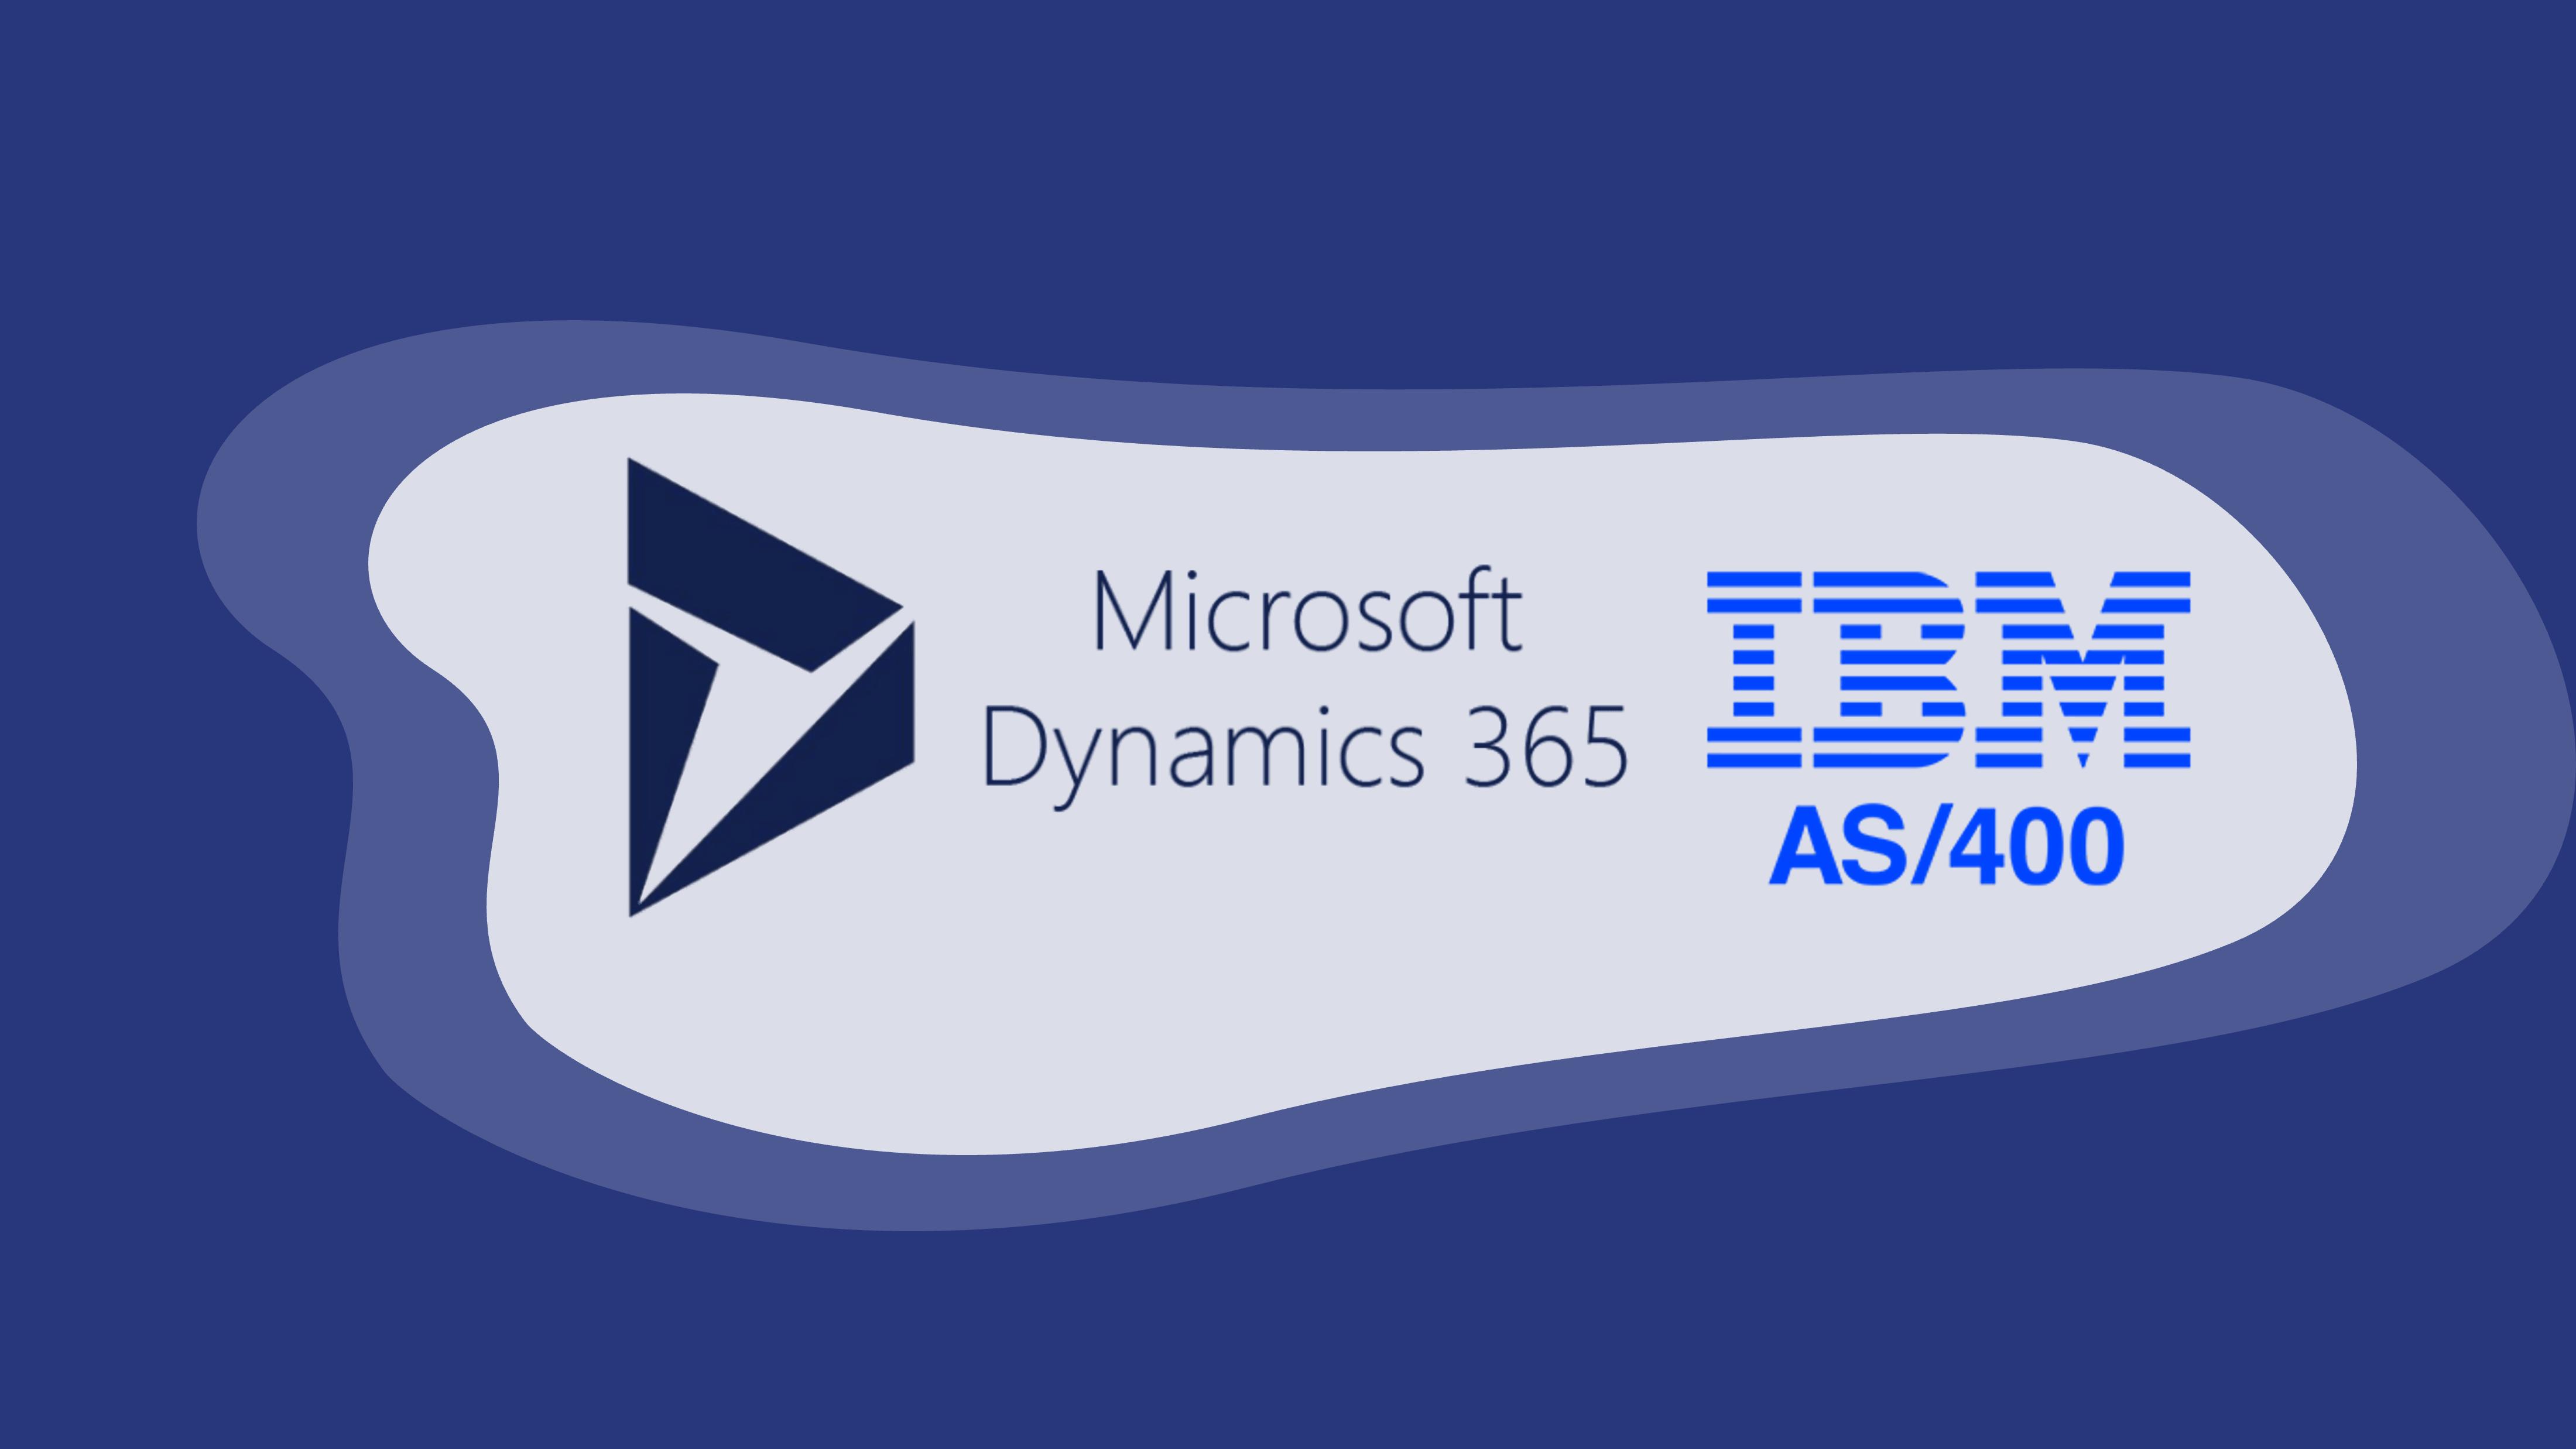 Integrazione Dynamics 365 - ACG AS/400